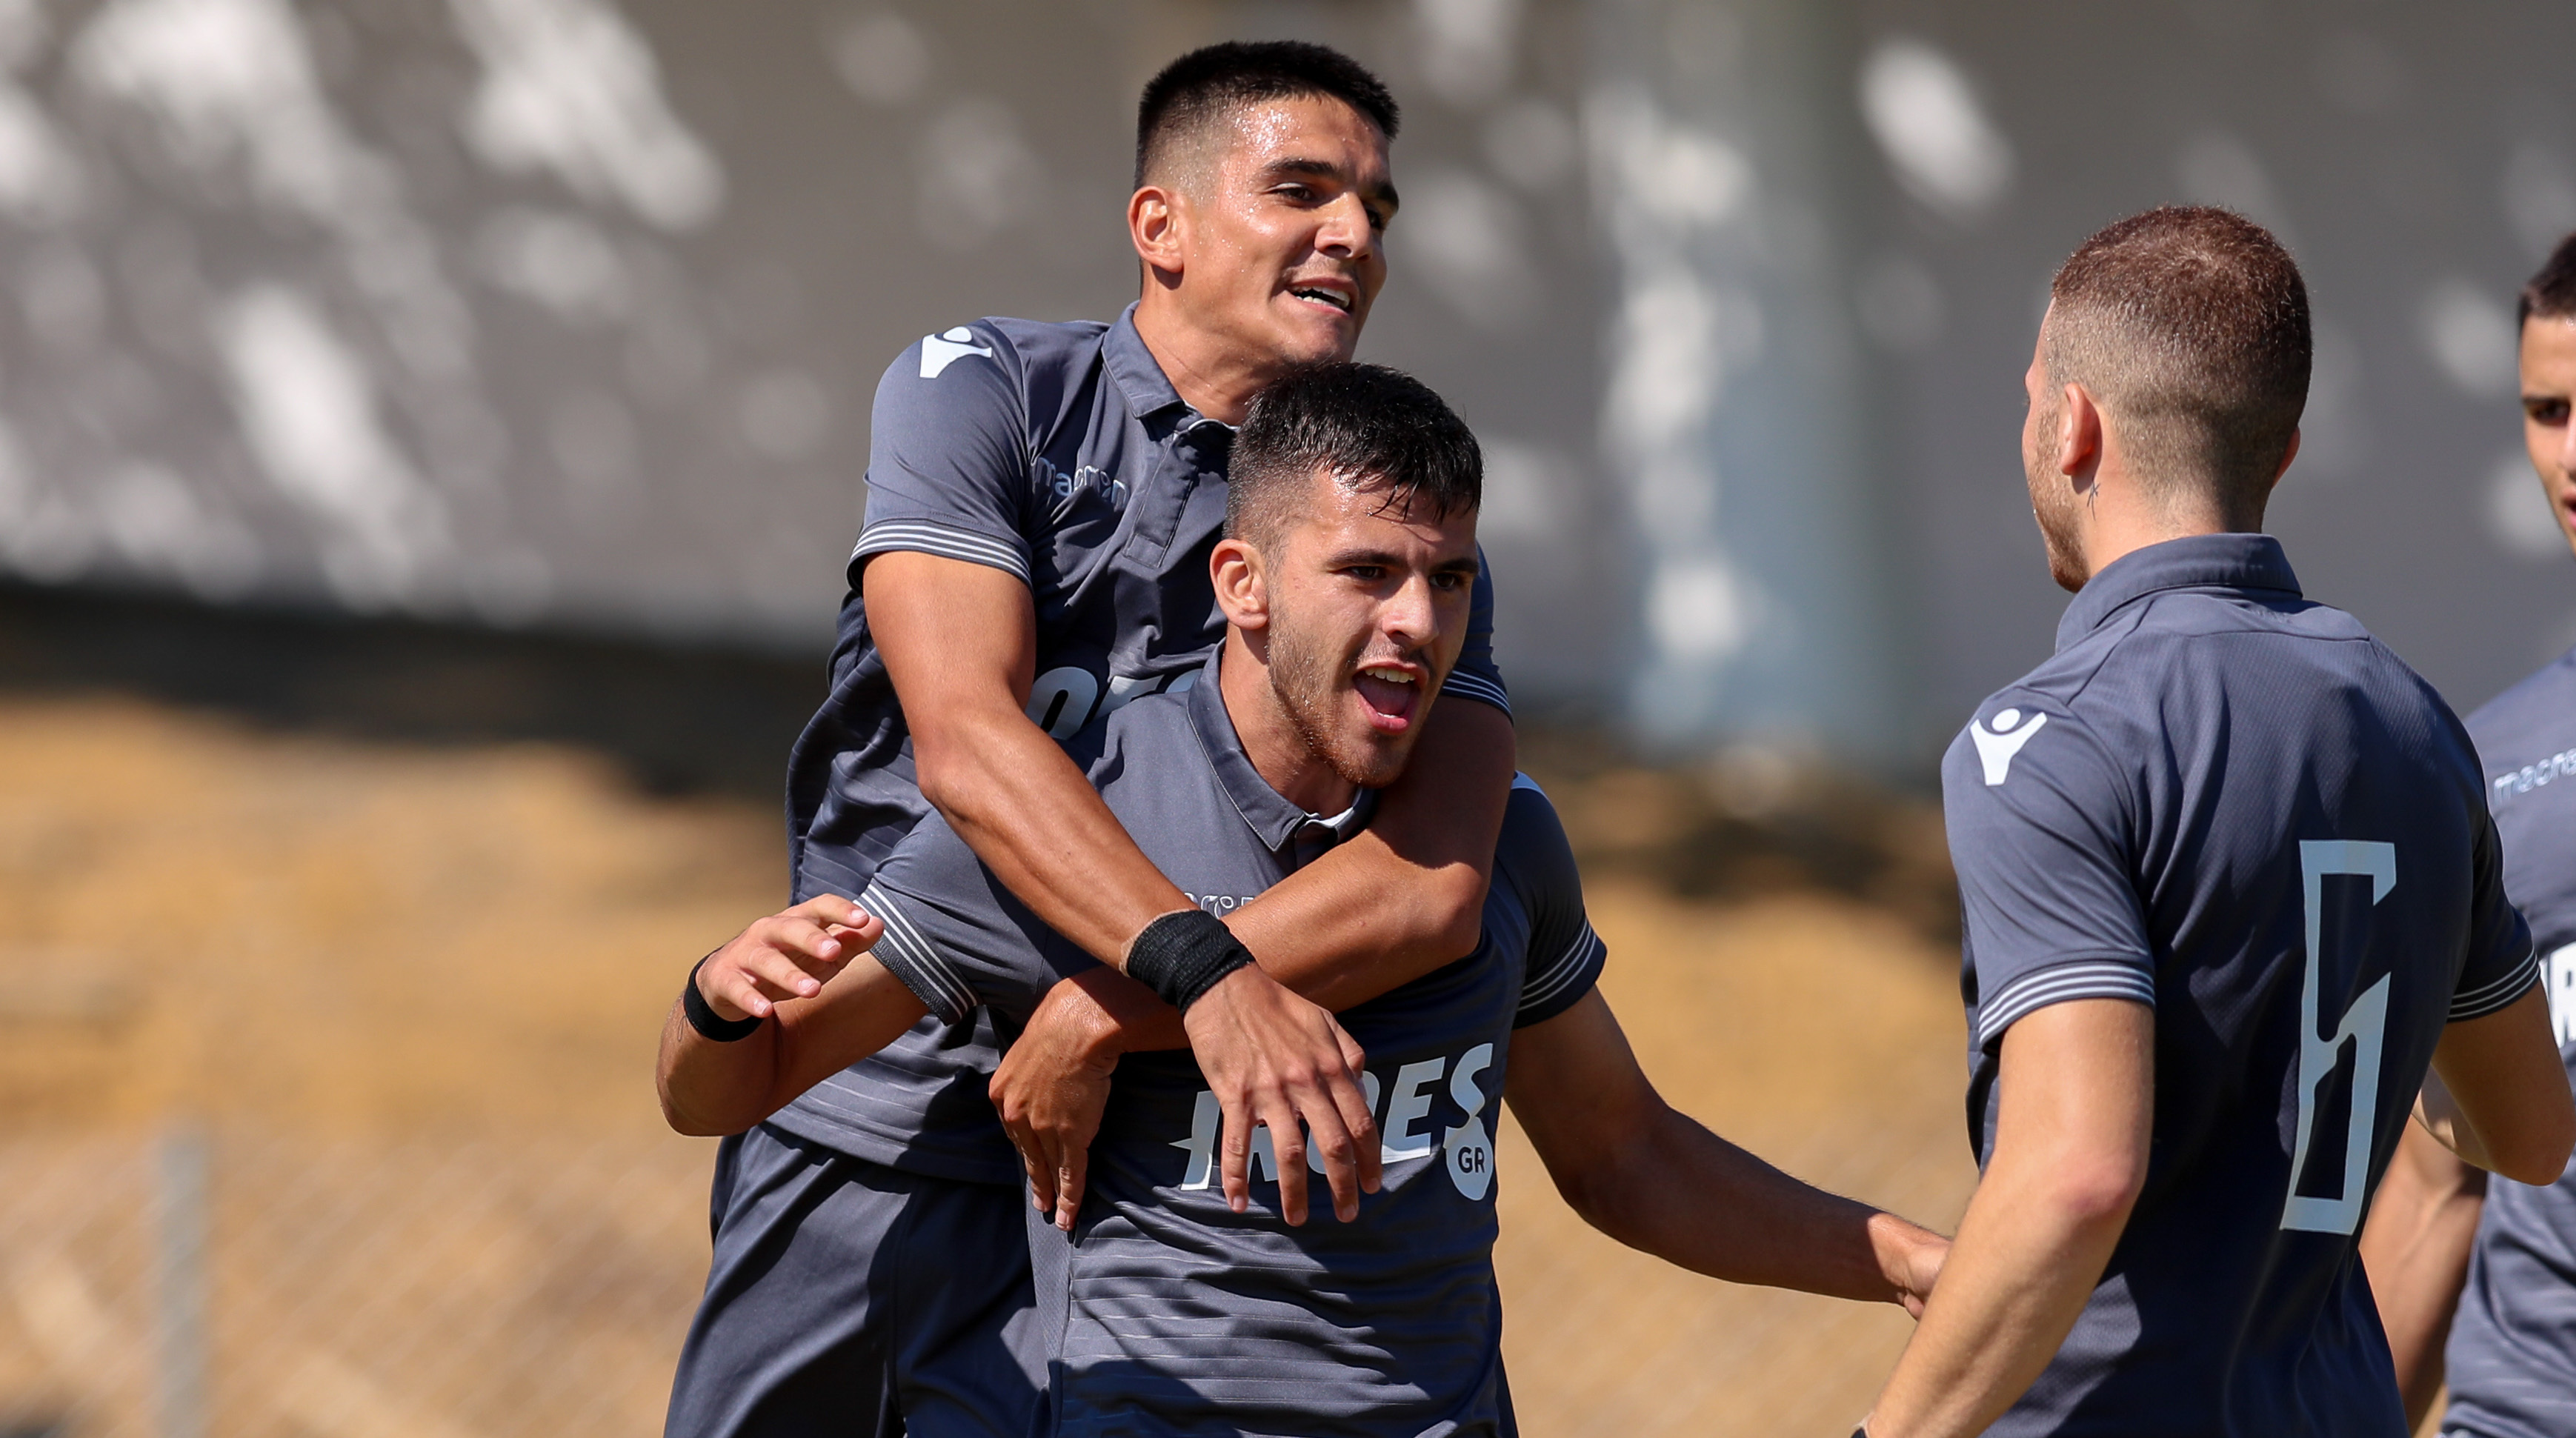 Моменты матча U-19 ОФИ-ΠΑΟΚ